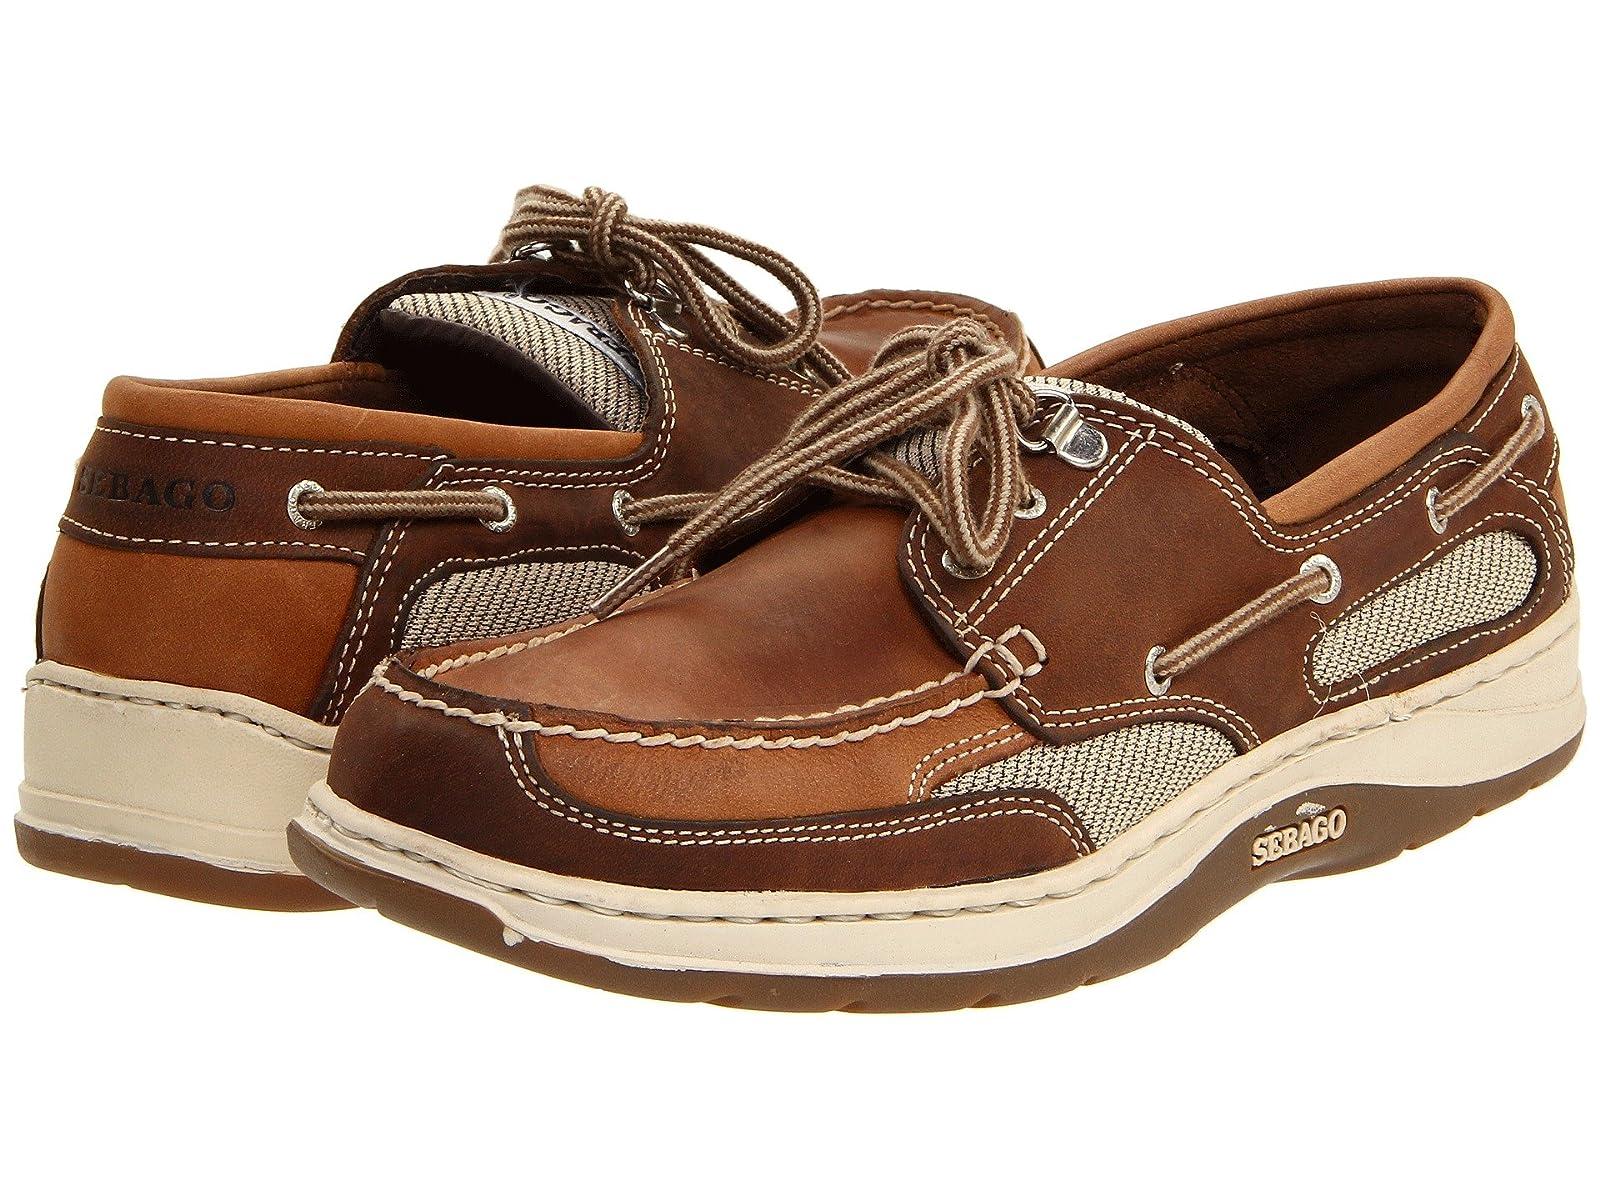 Sebago Clovehitch IICheap and distinctive eye-catching shoes